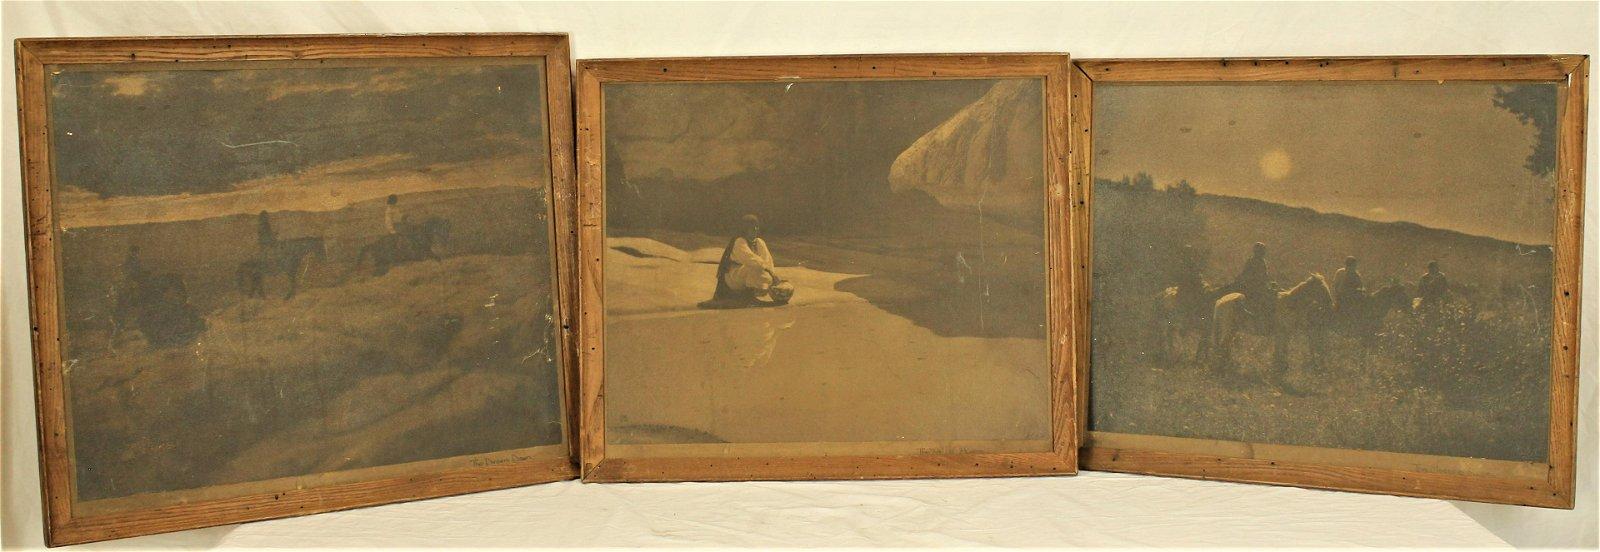 Carl Moon Enlarged Silver Gelatin Photographs